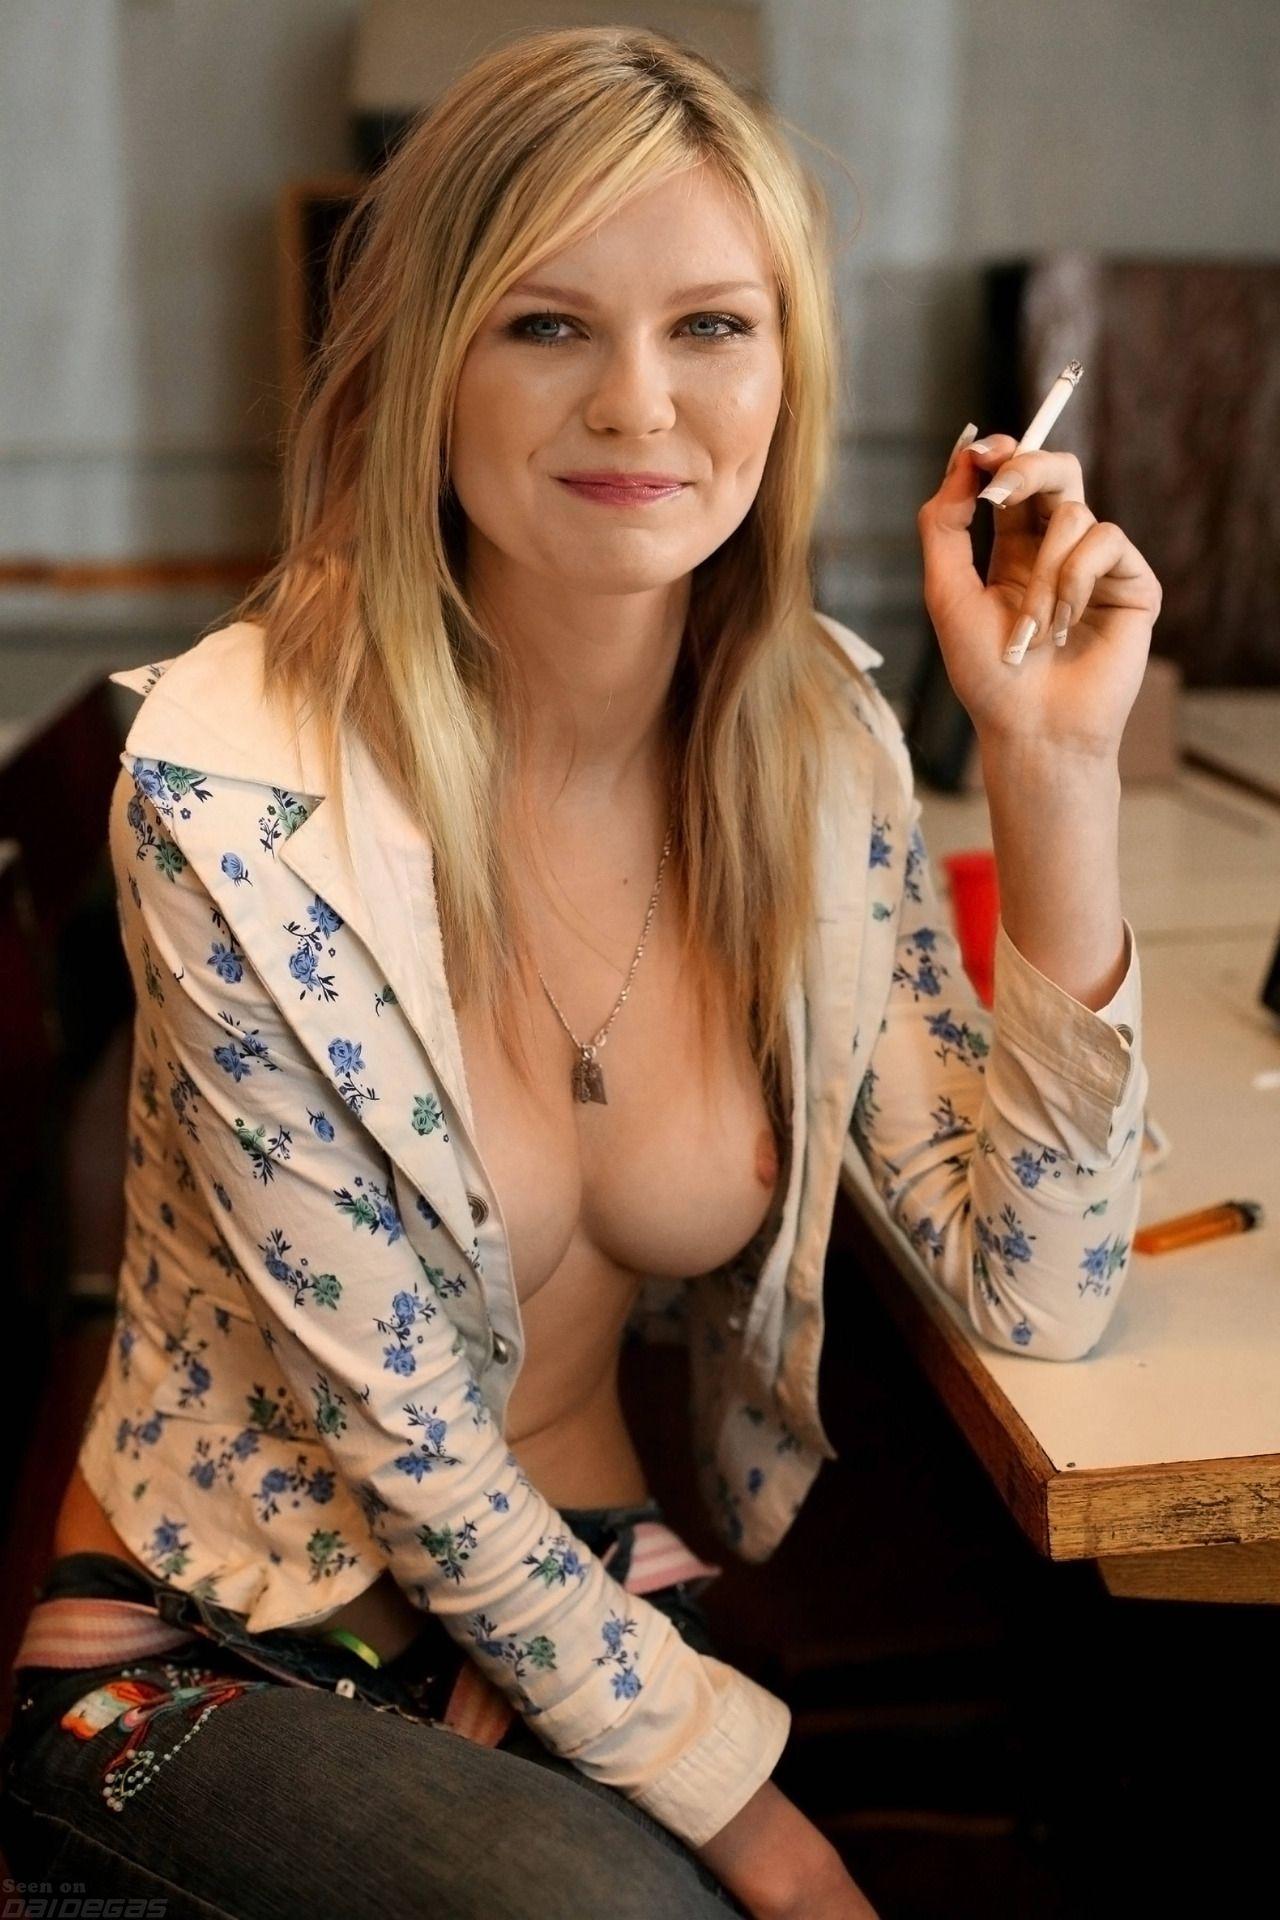 Scarlett Johansson Kirsten Dunst Jennifer Connelly Bikini Pictures Celebs Female Celebrities